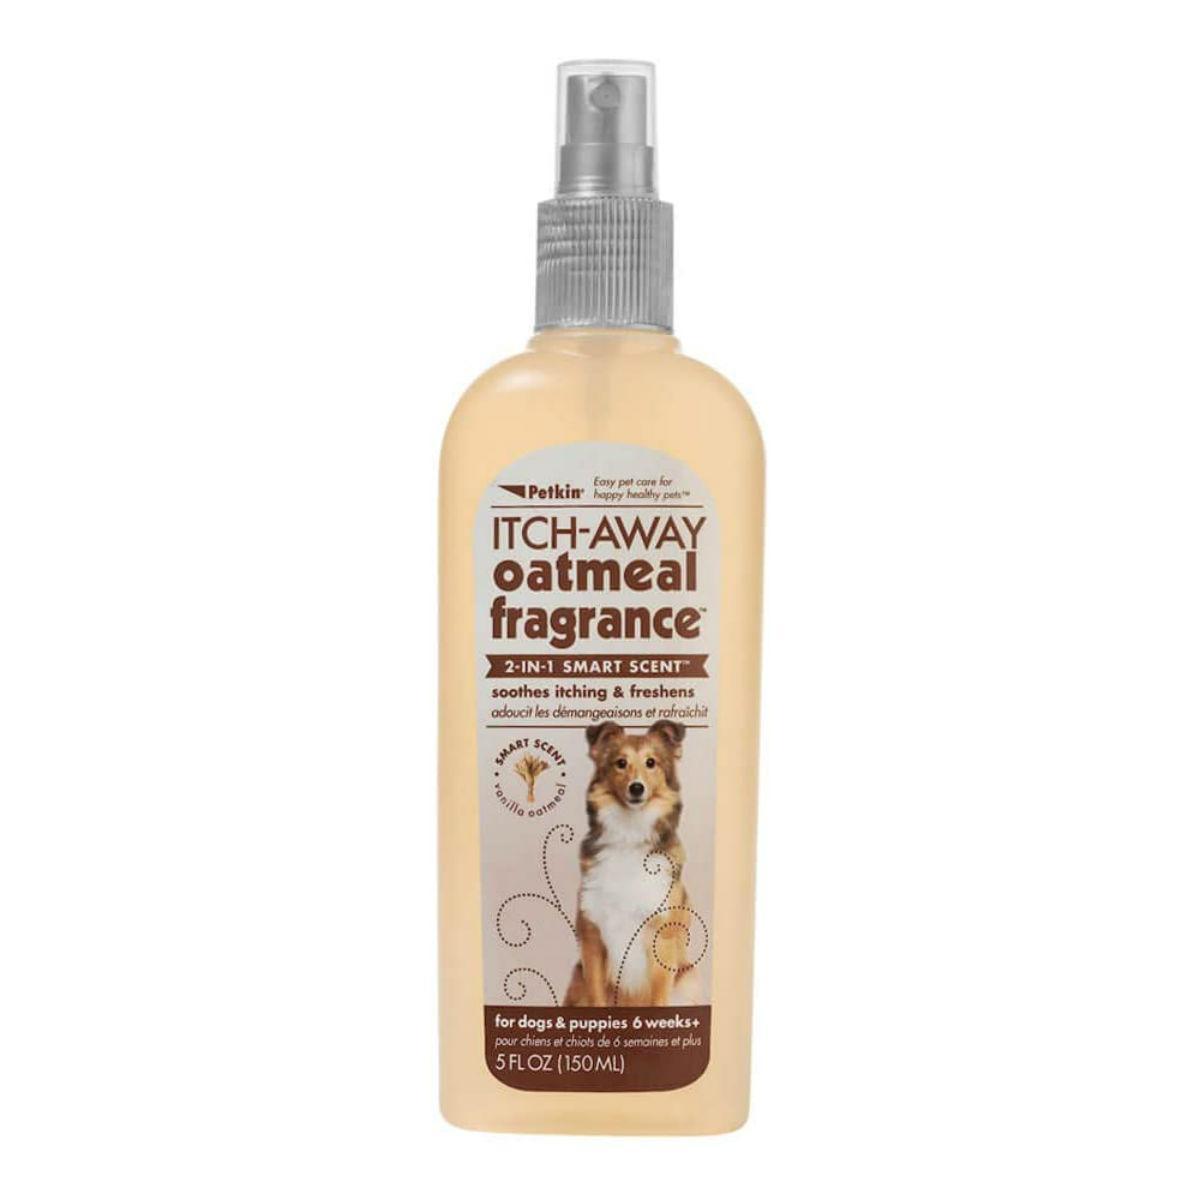 PetKin Itch-Away Oatmeal Dog Fragrance